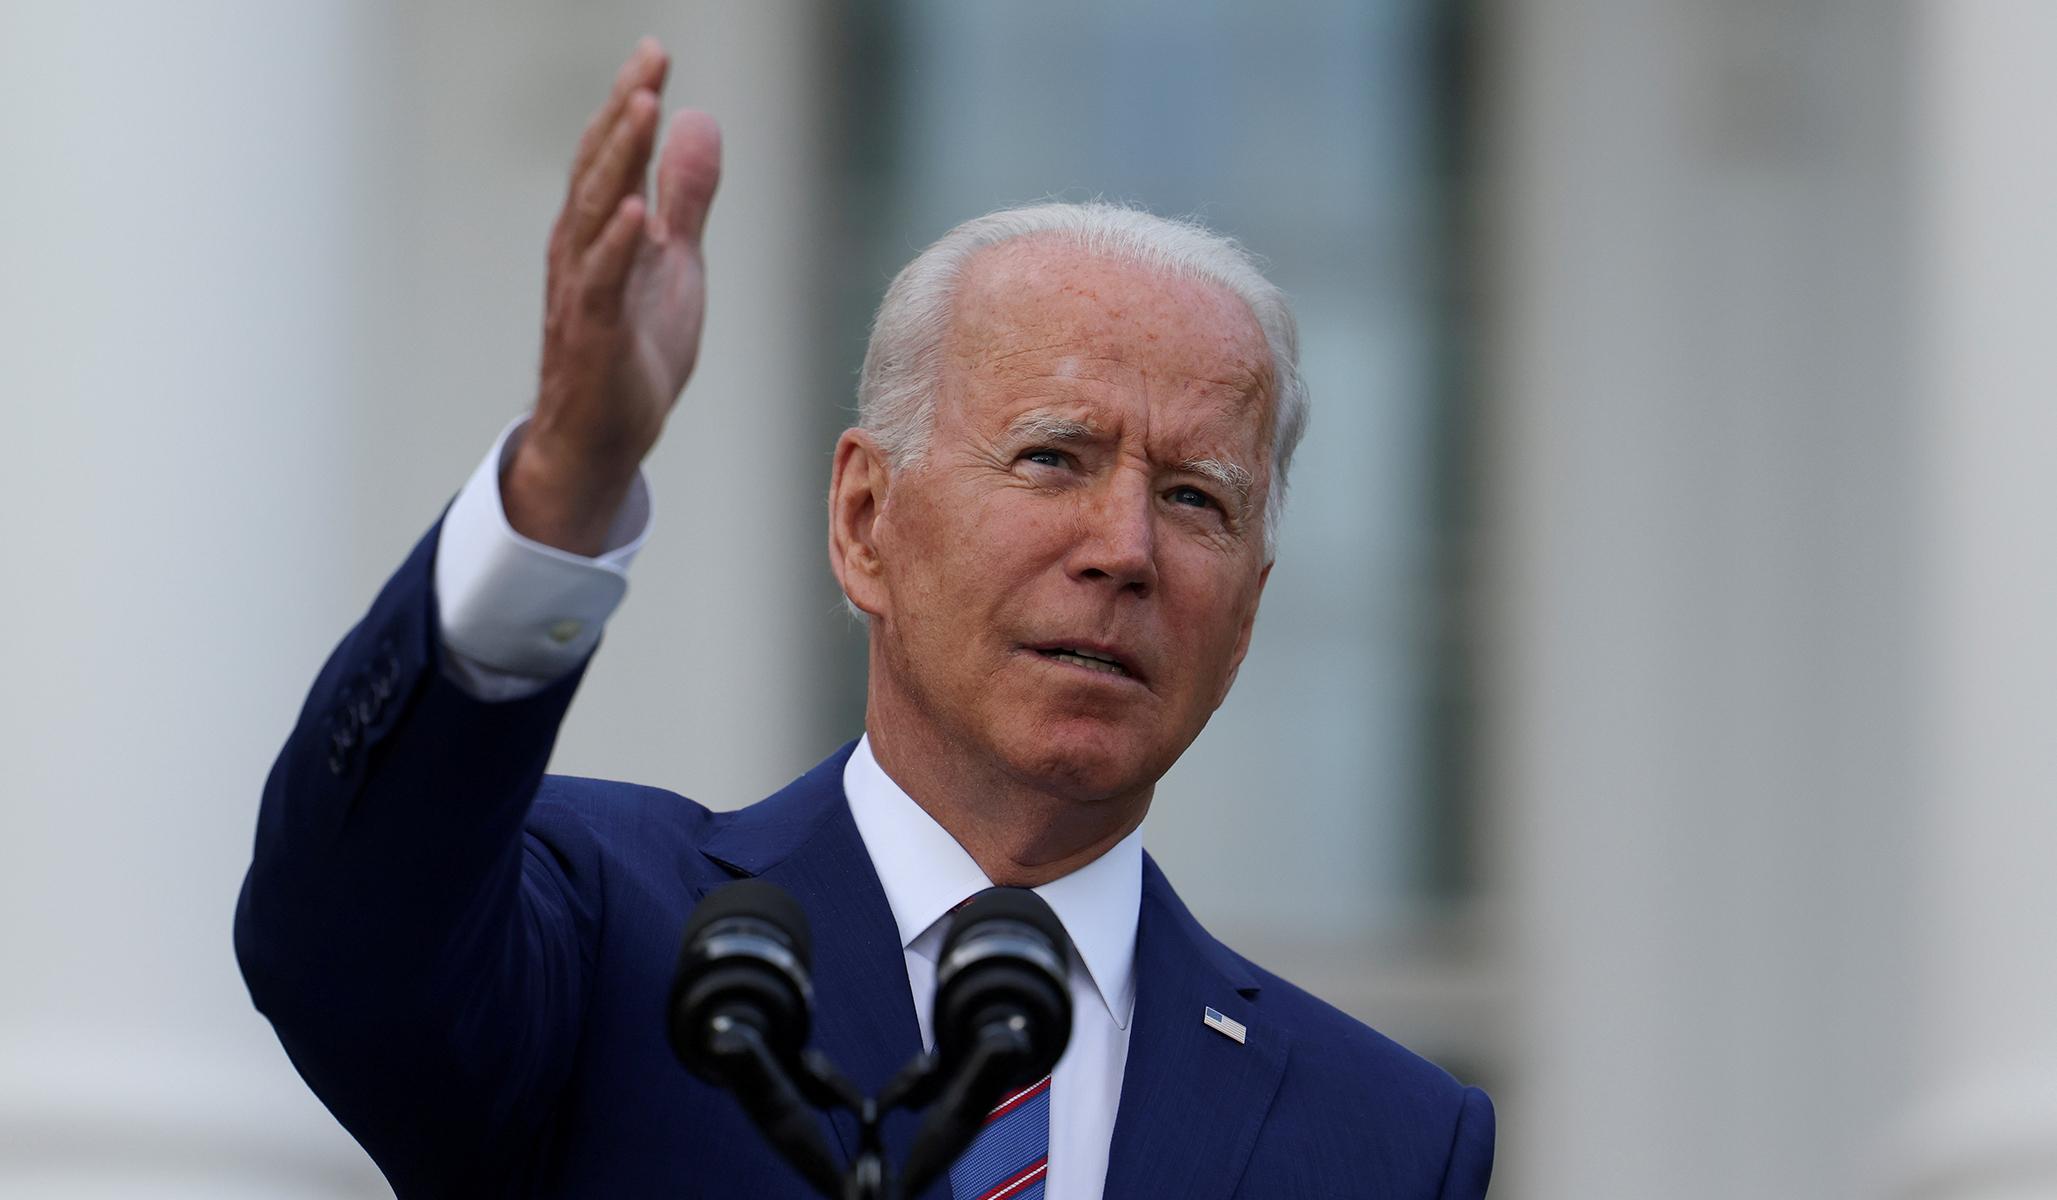 Biden Urges States to Offer $100 Vaccine Incentives